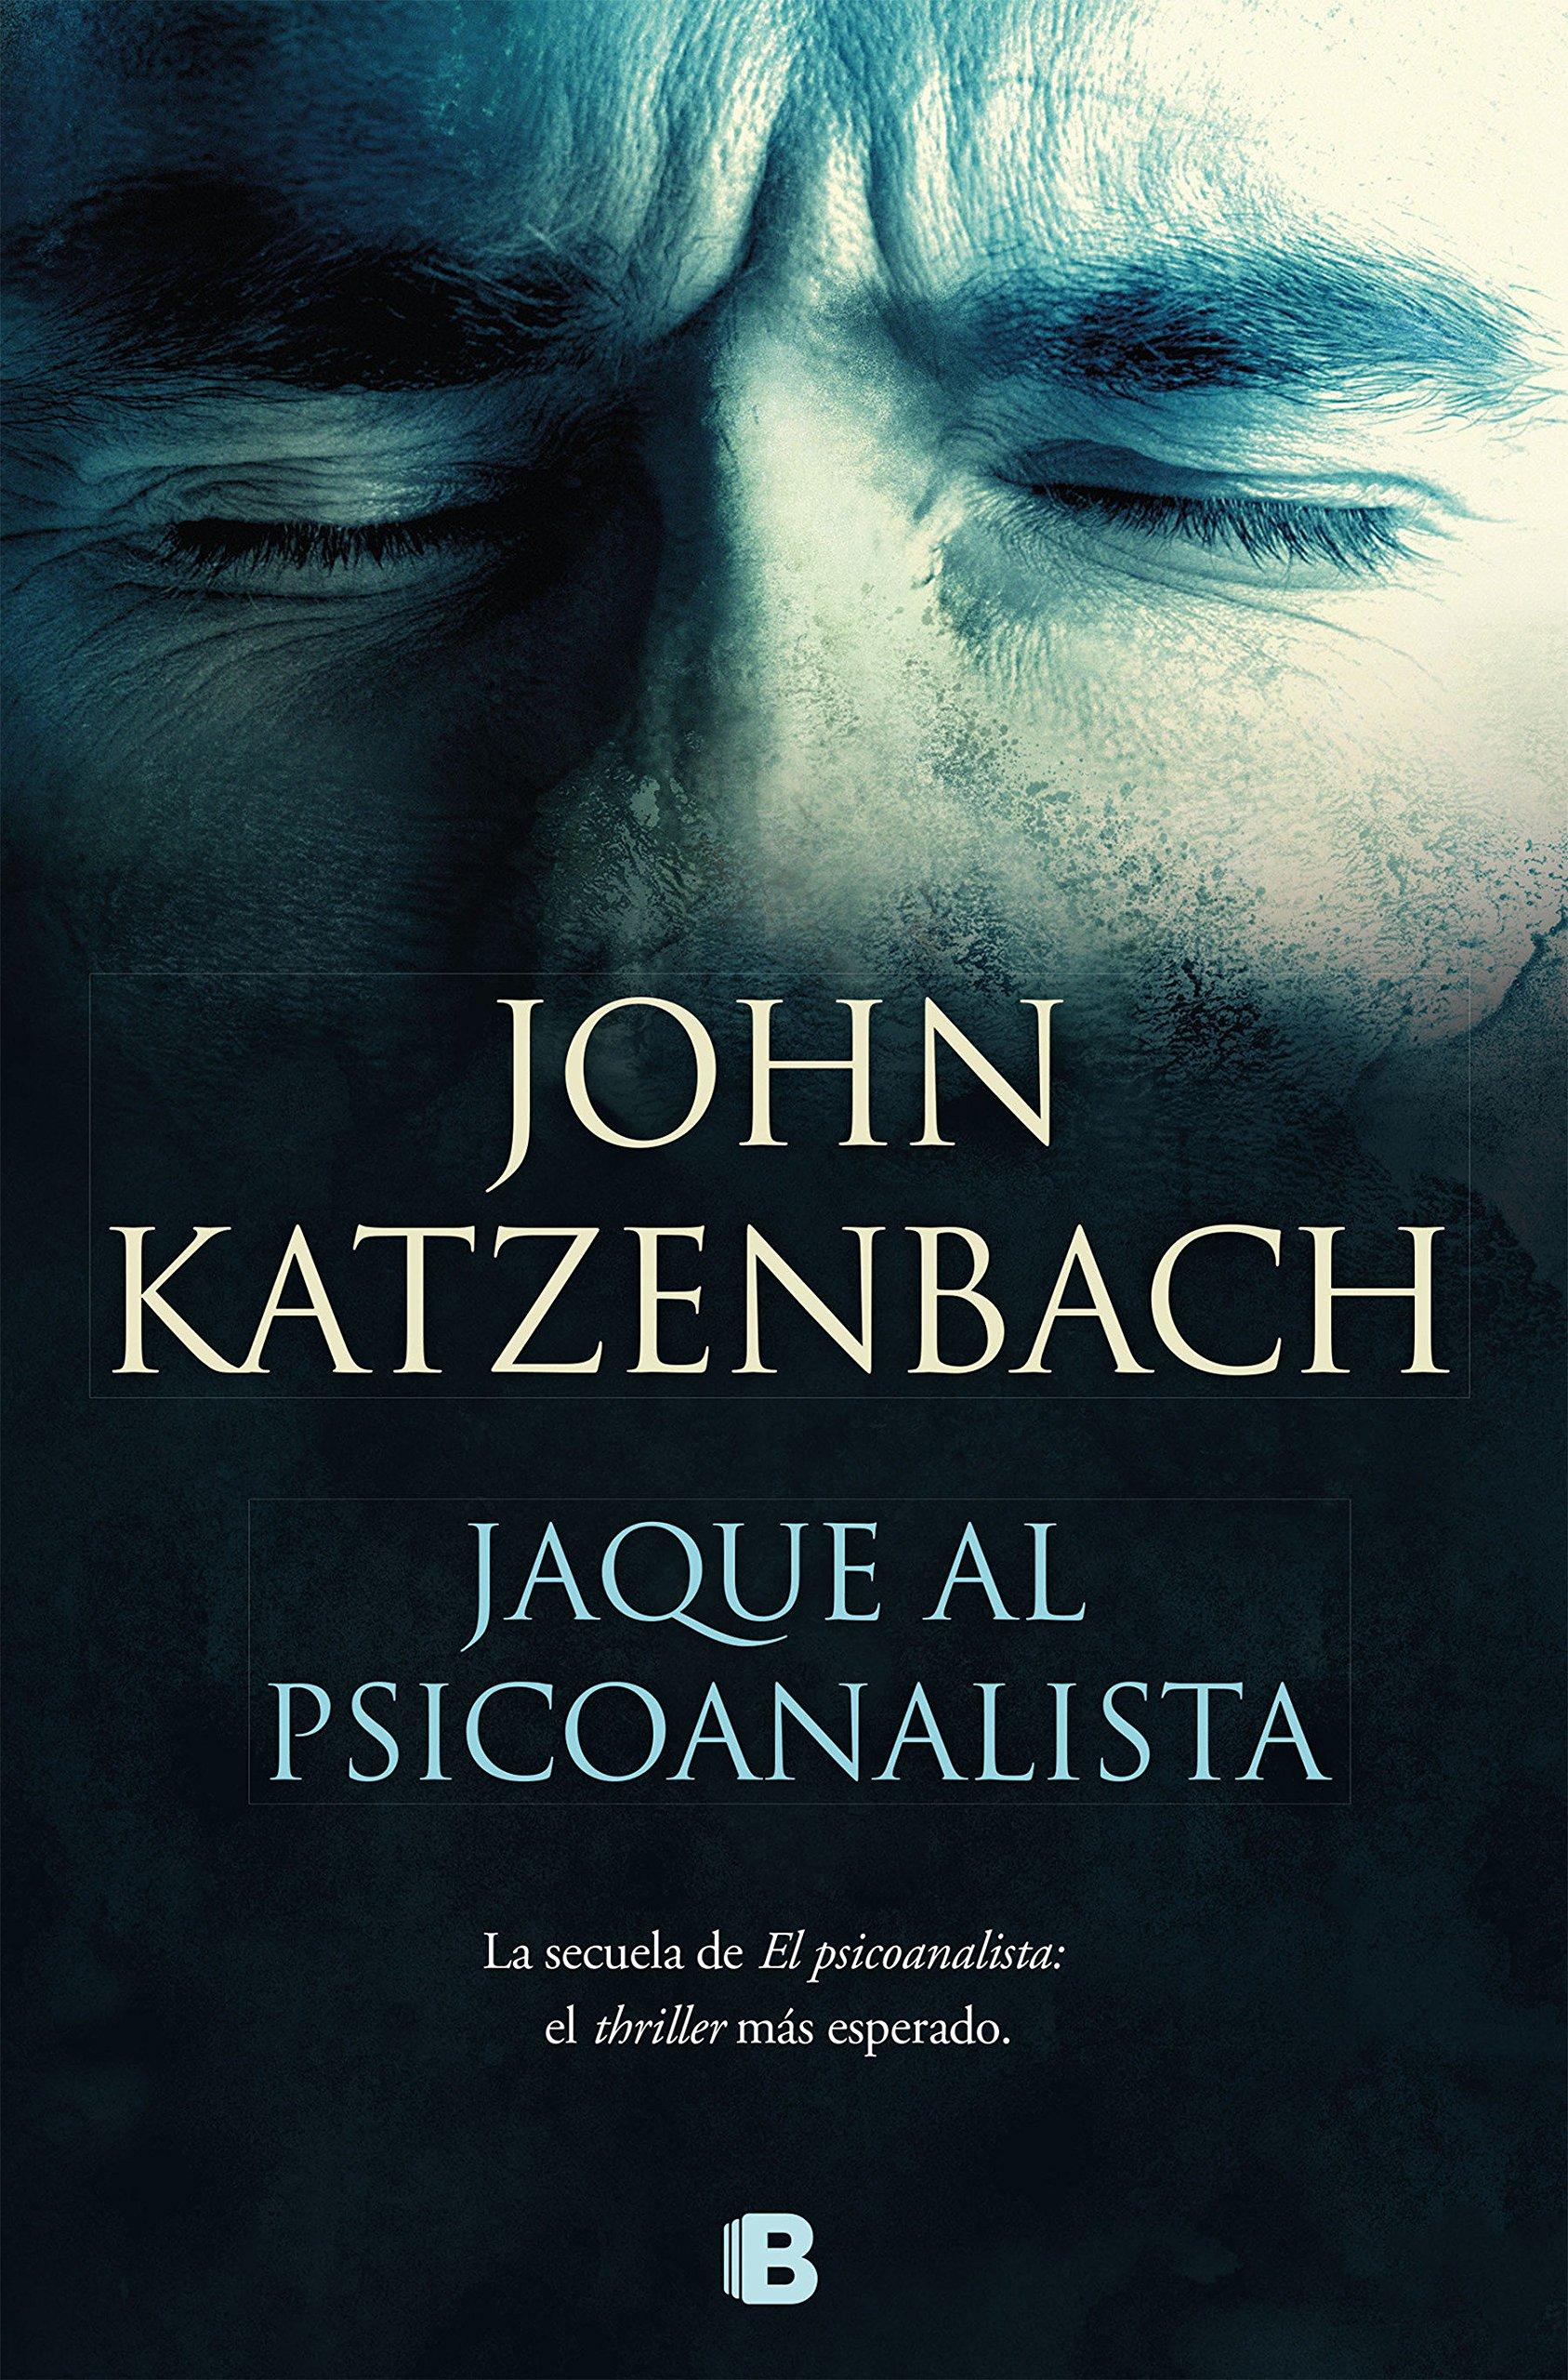 Jaque al psicoanalista / The Analyst II (Spanish Edition): John Katzenbach:  9781949061345: Amazon.com: Books